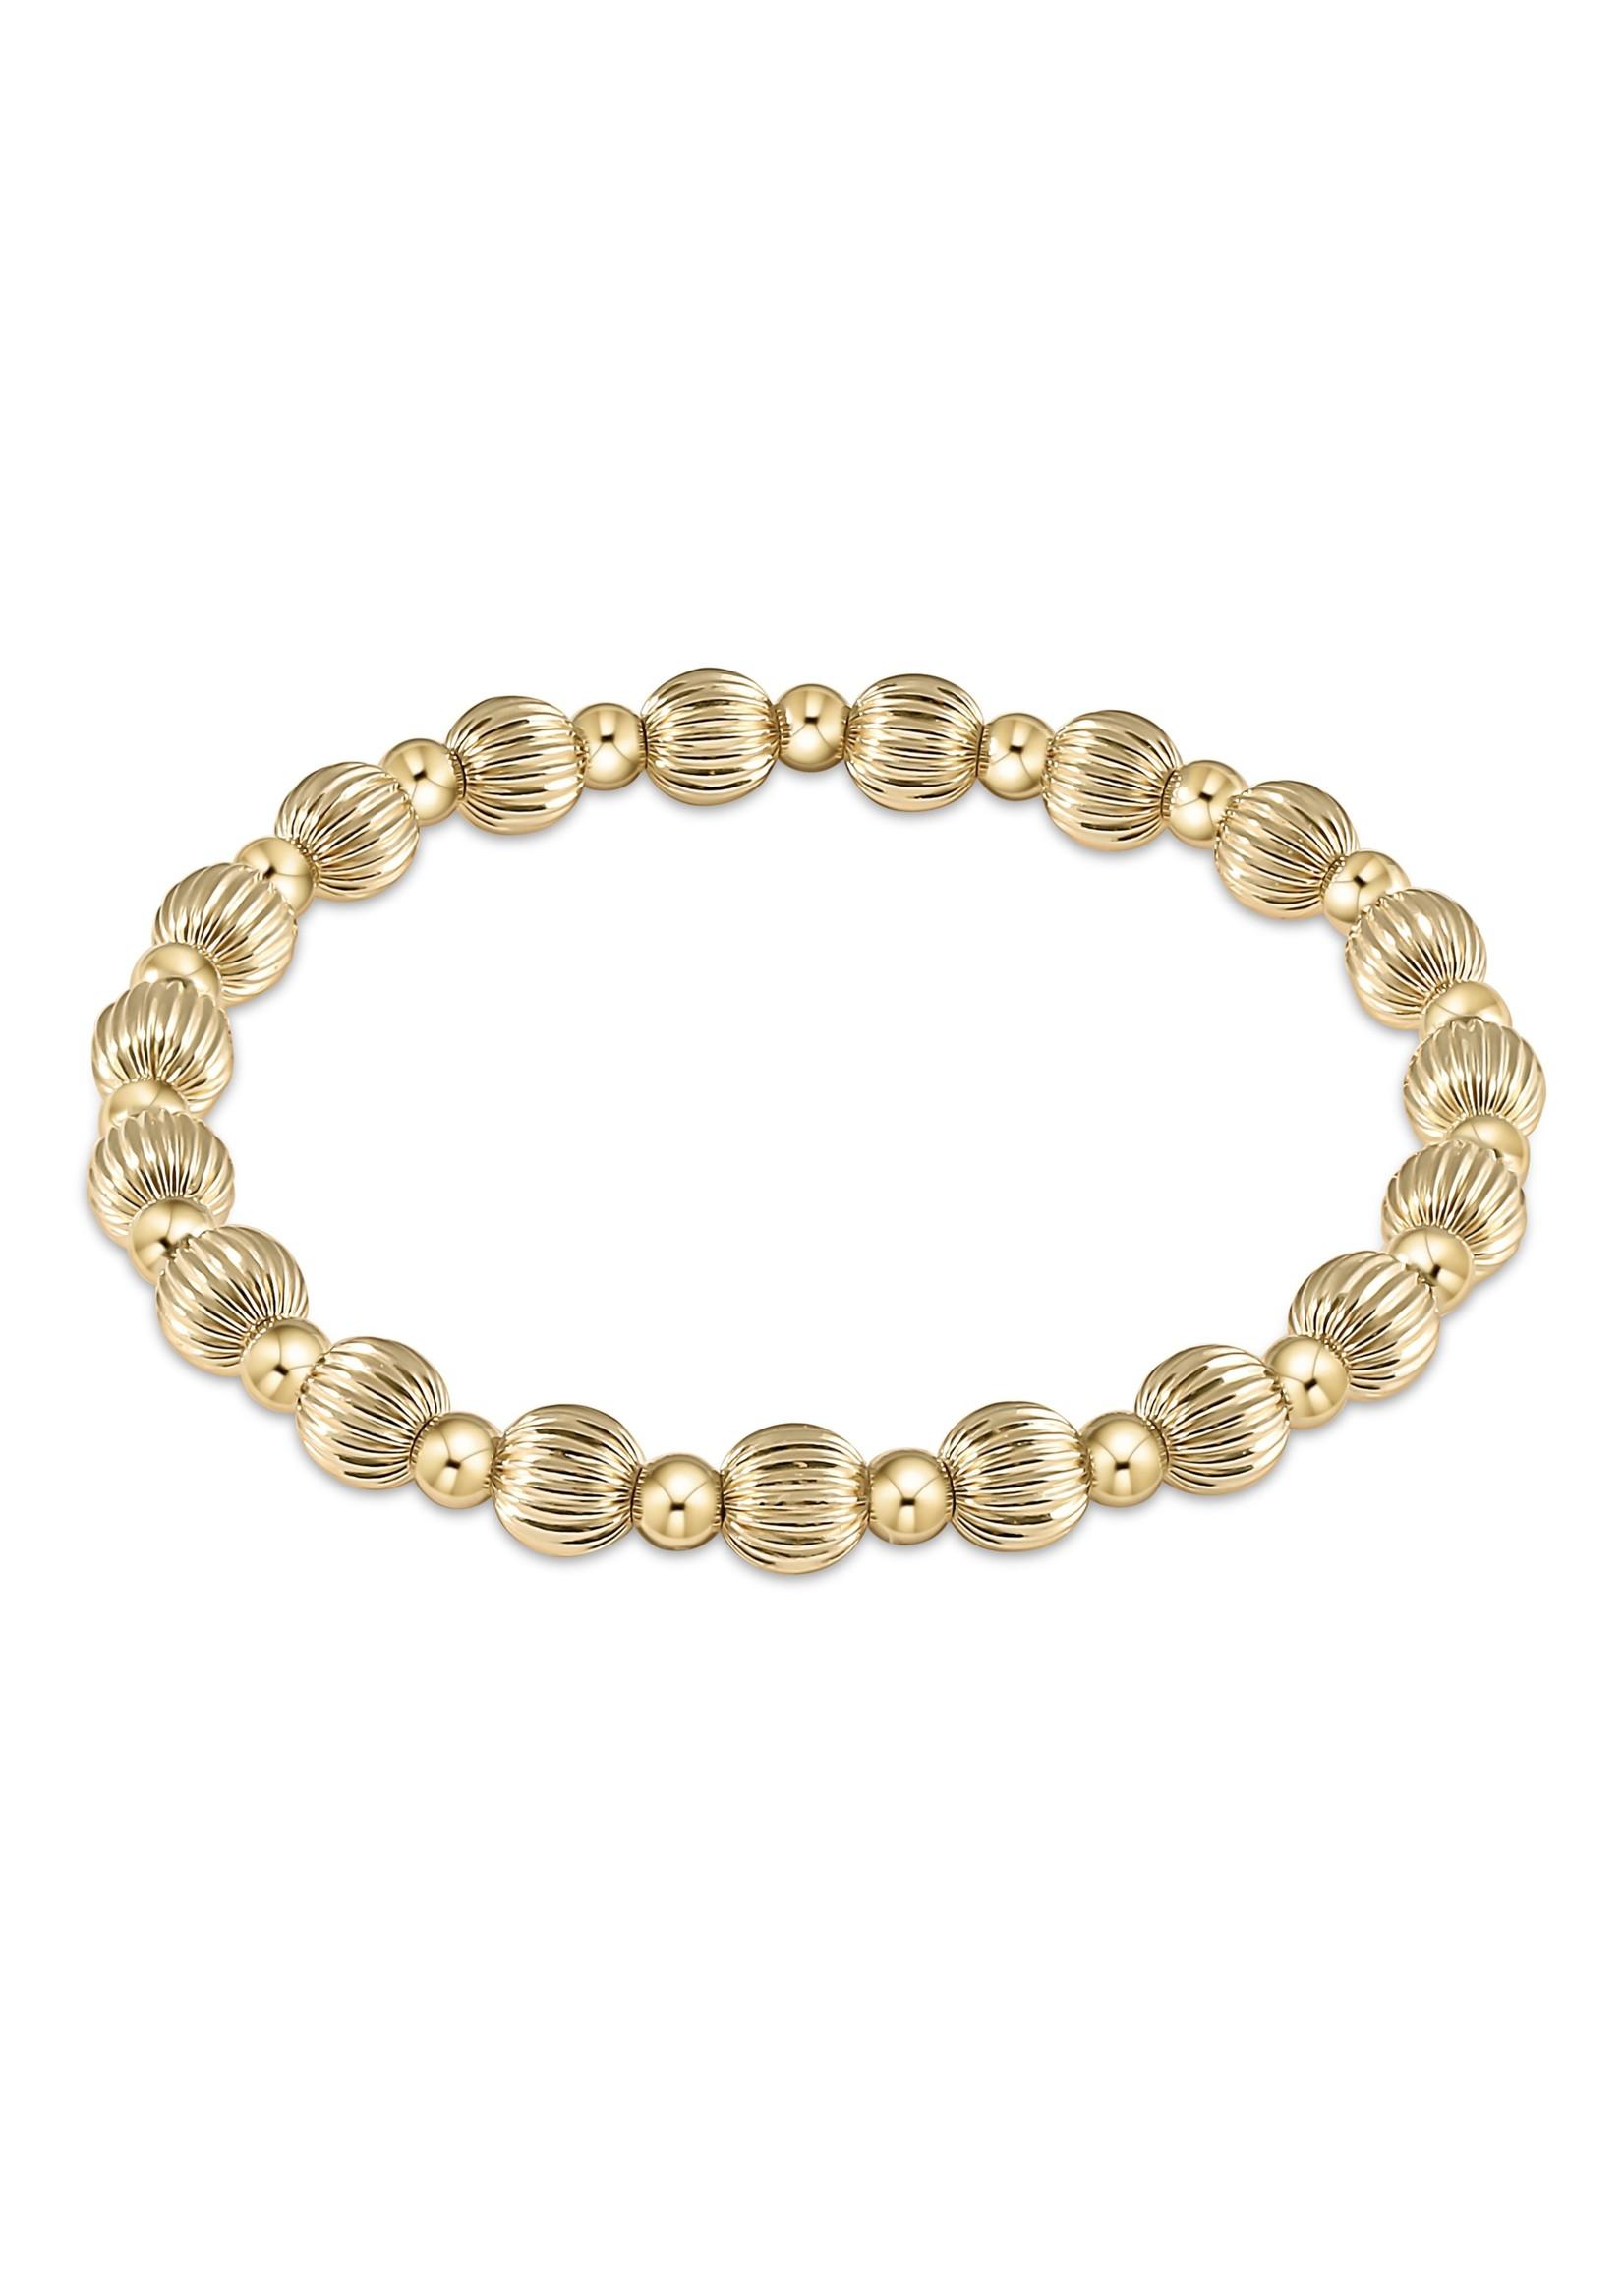 enewton Dignity Grateful Pattern 6mm Bead Bracelet - Gold